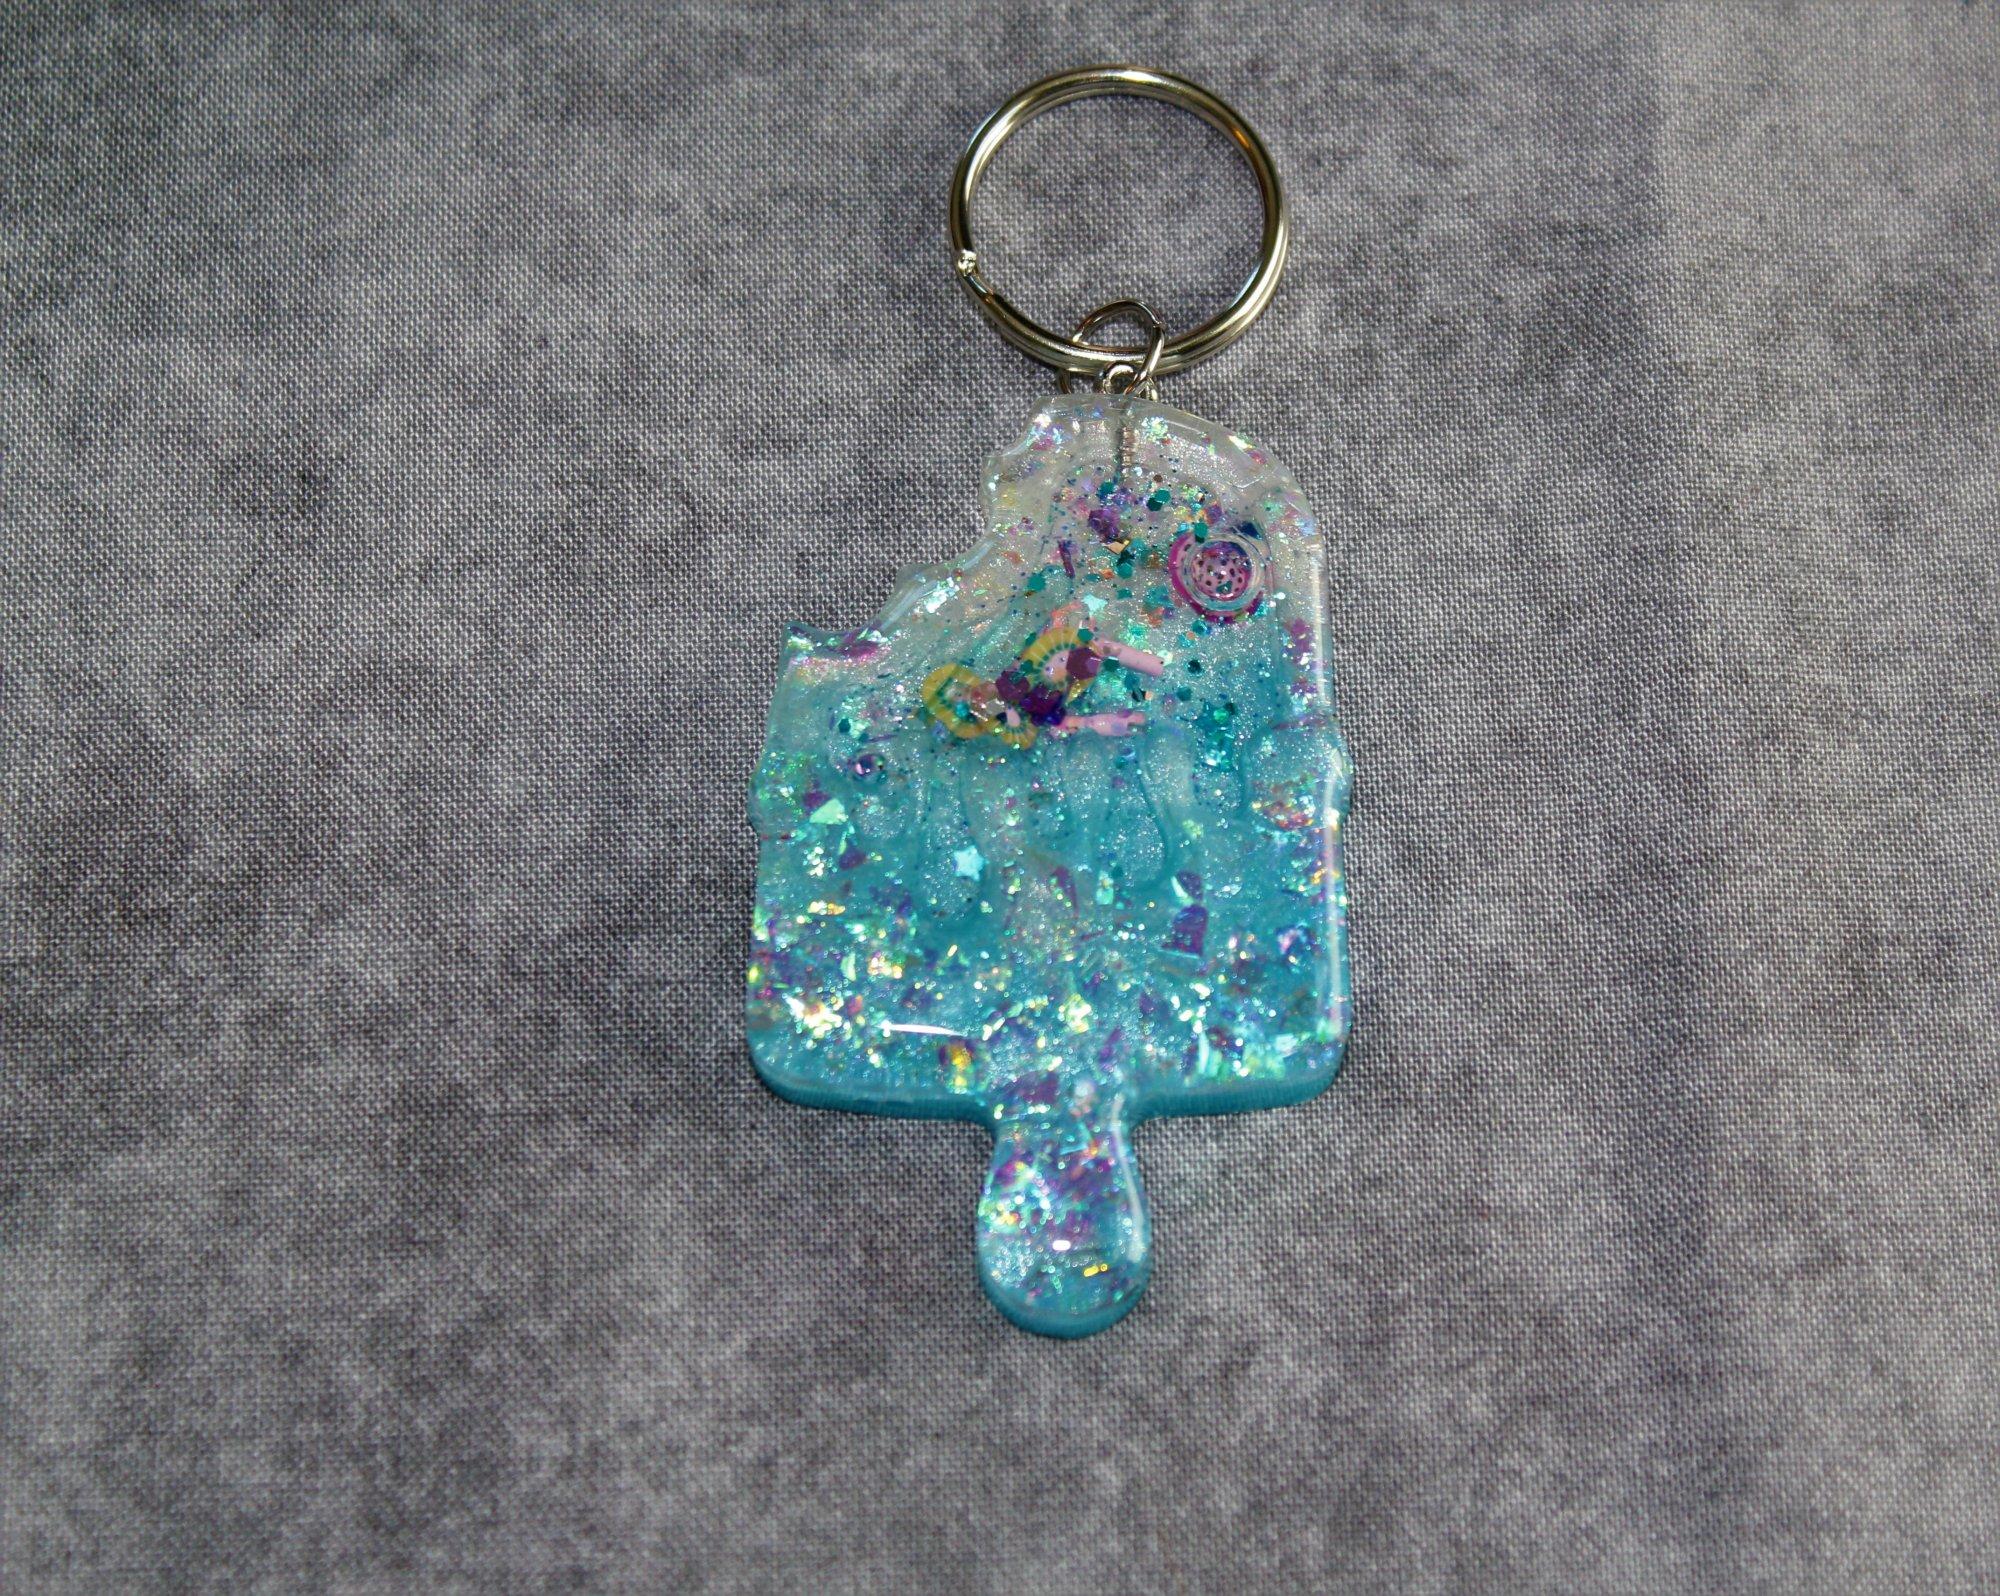 Kiwi Popsicle Shaker Keychain